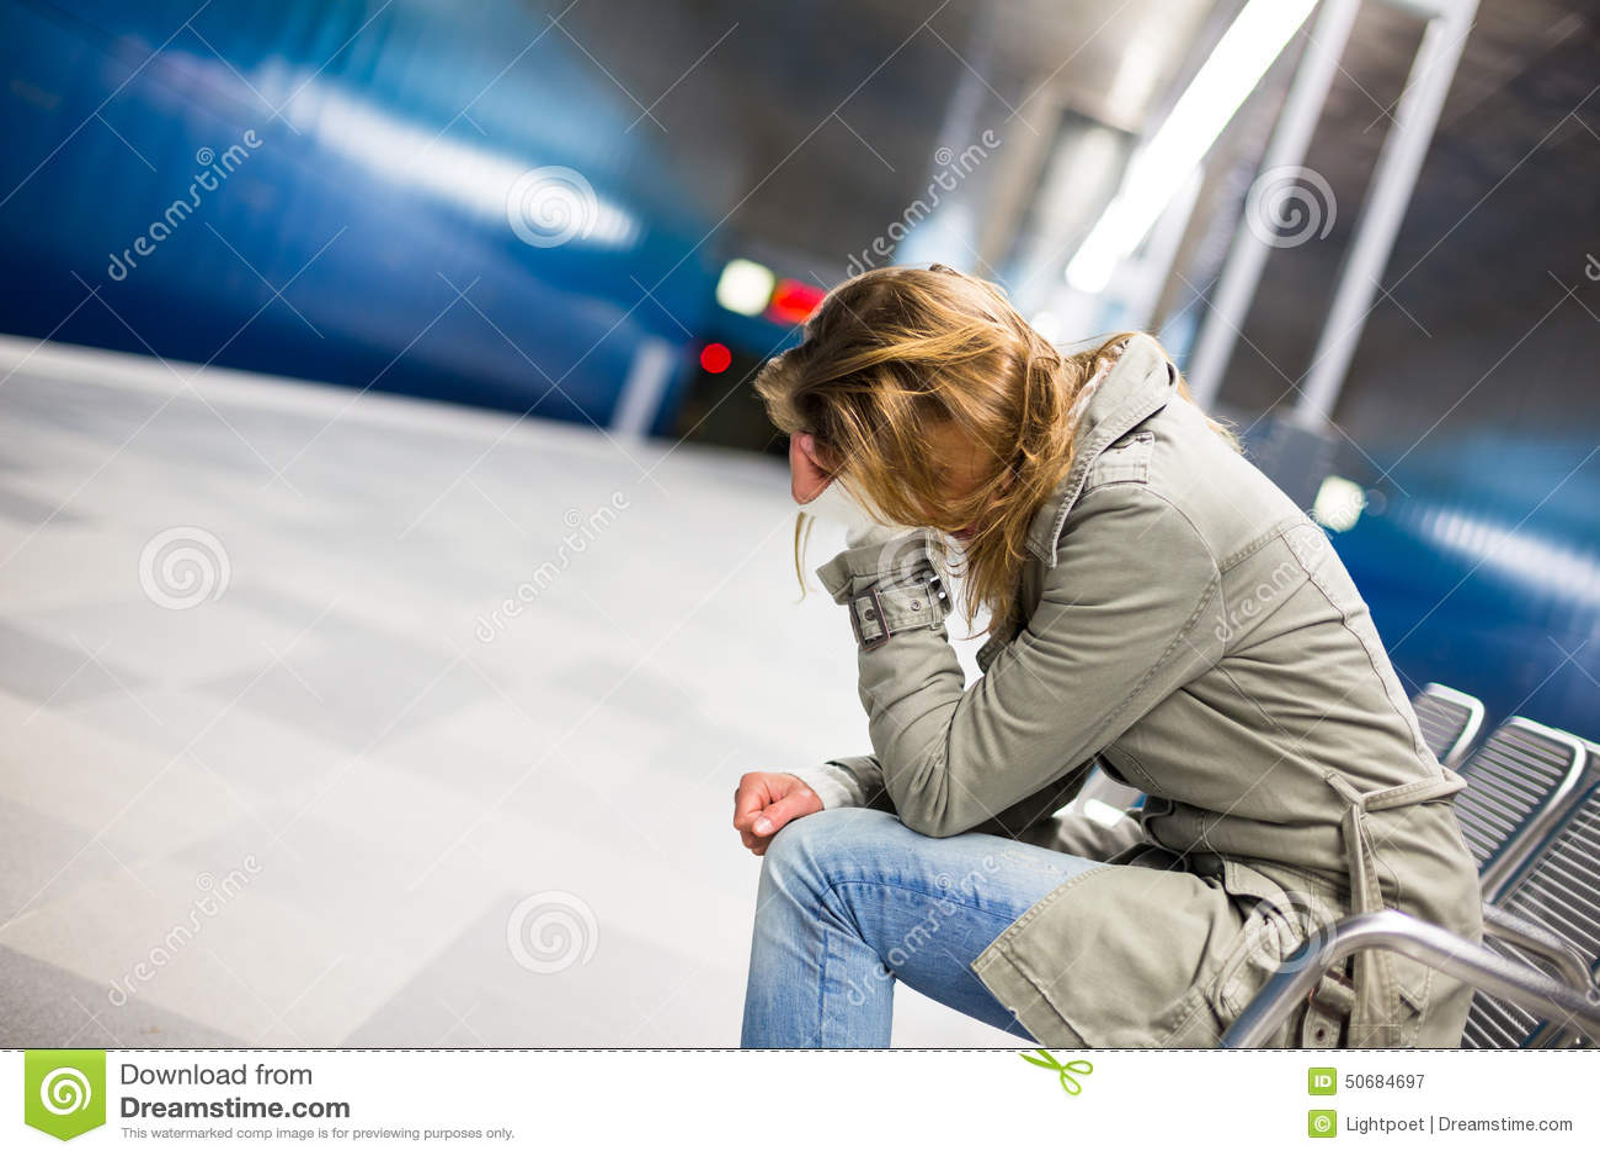 Download 哀伤和单独在一个大城市 库存图片. 图片 包括有 情感, 全能, 城市, 疲劳, 不适, 题头, 偏头痛 - 50684697